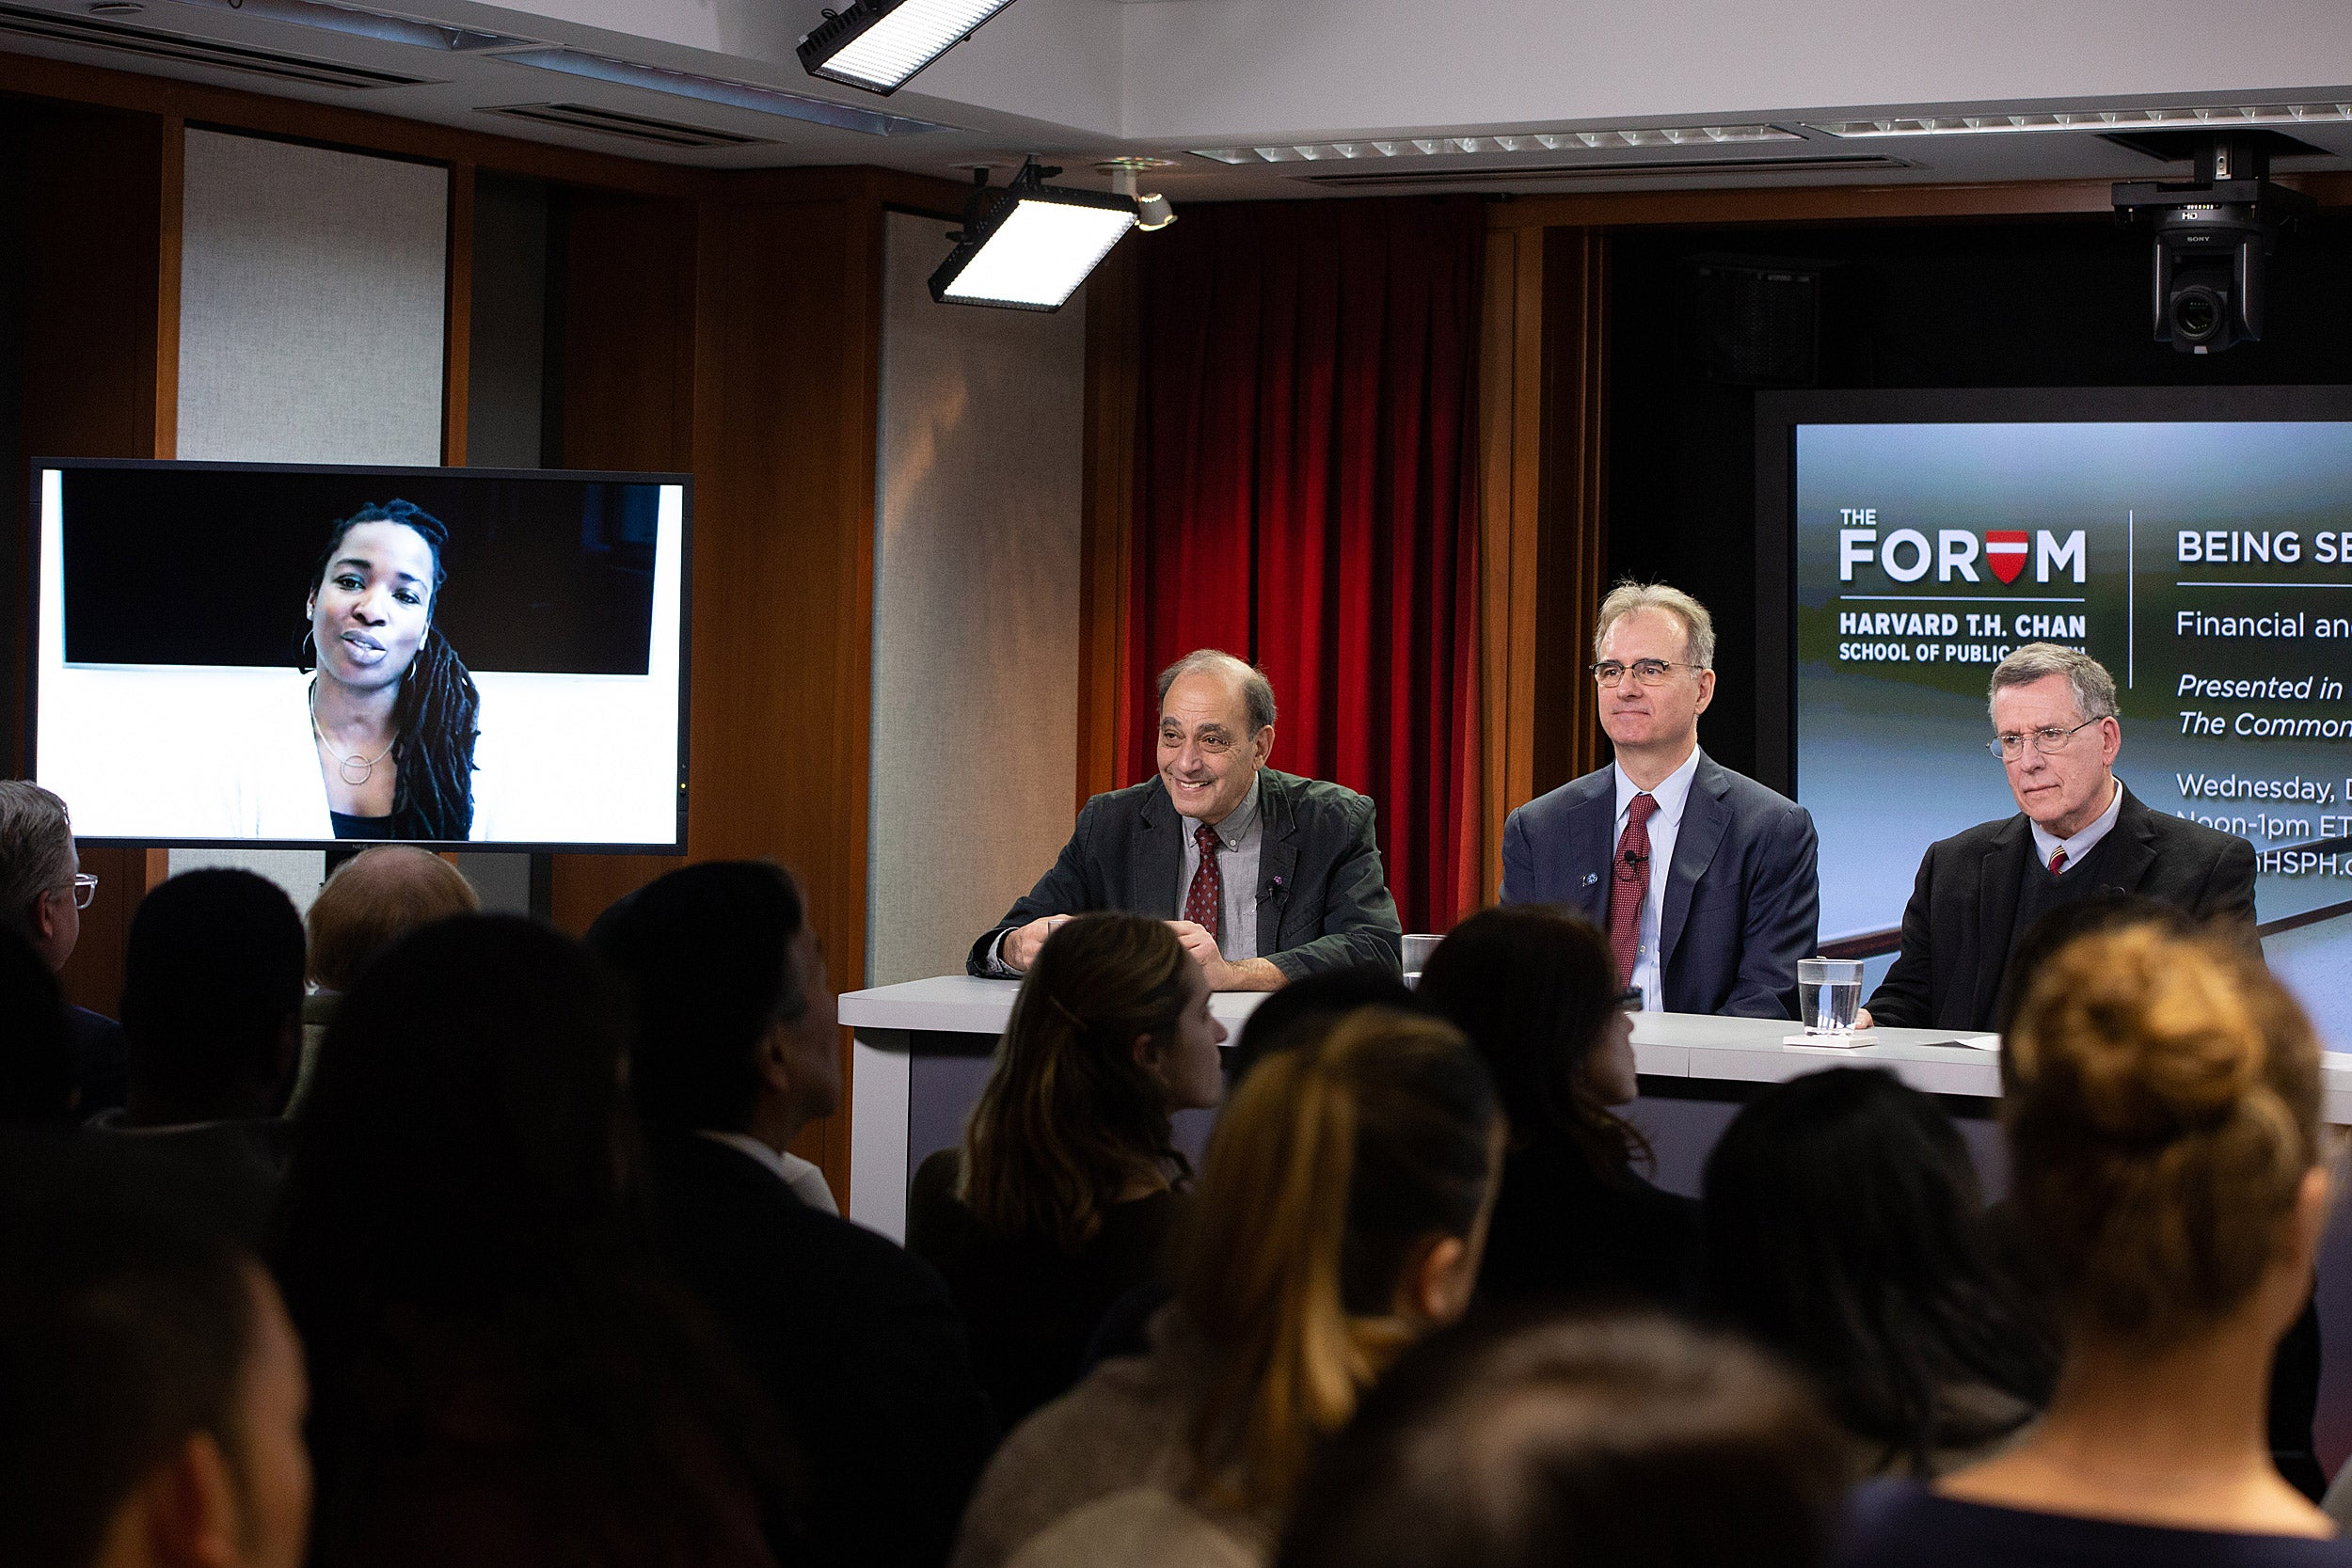 Harvard Chan School forum on Seriously Ill in America: Panelists Toyin Ajayi, Robert Master, Eric Schneider, Robert Blendon.